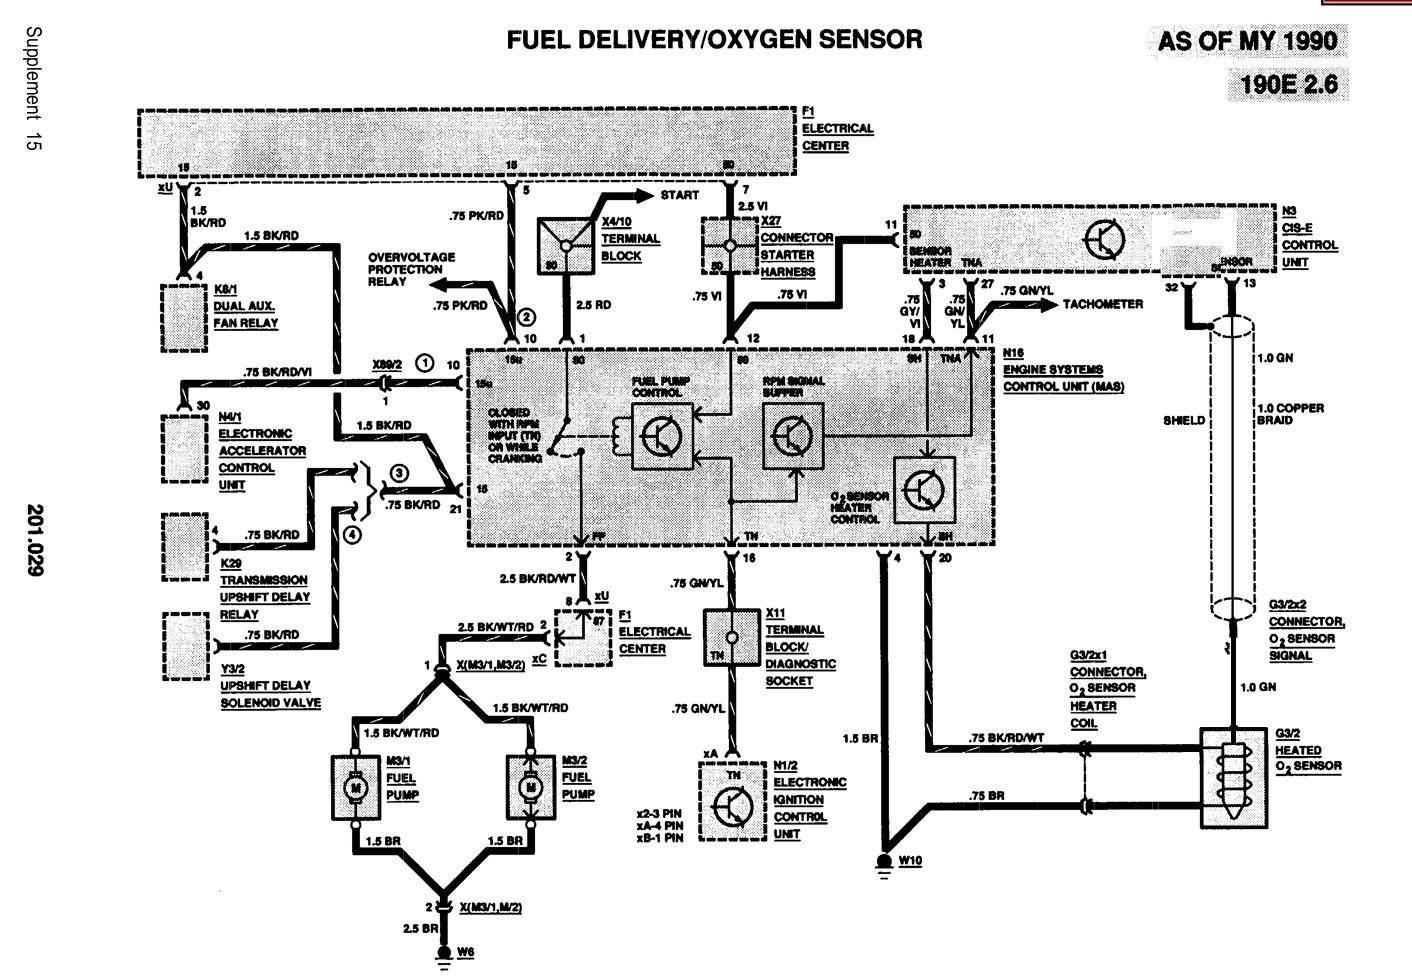 Mas Relay  The O2 Heater Power Source